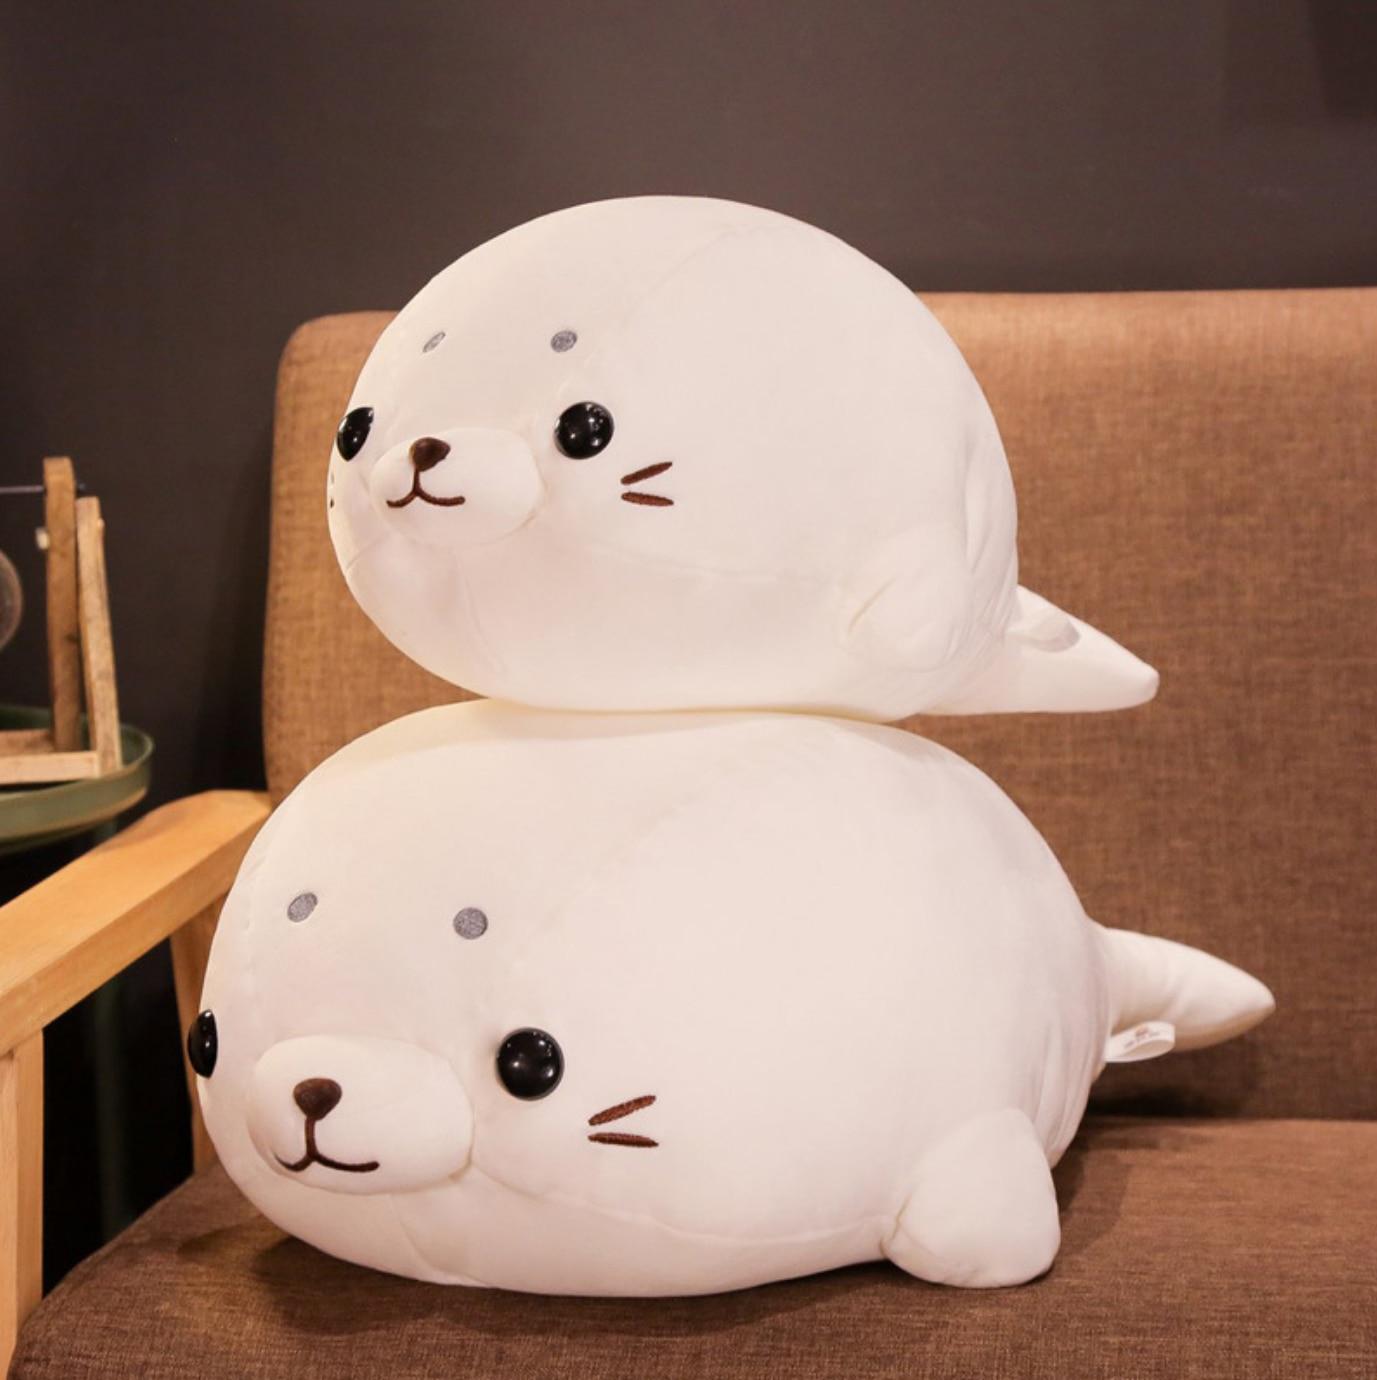 Kawaii 50/60cm Seal Soft Down Cotton Lying Seal Plush Toy Stuffed Animal Doll Toys For Kid Girl Pillow Home Decor Birthday Gifts